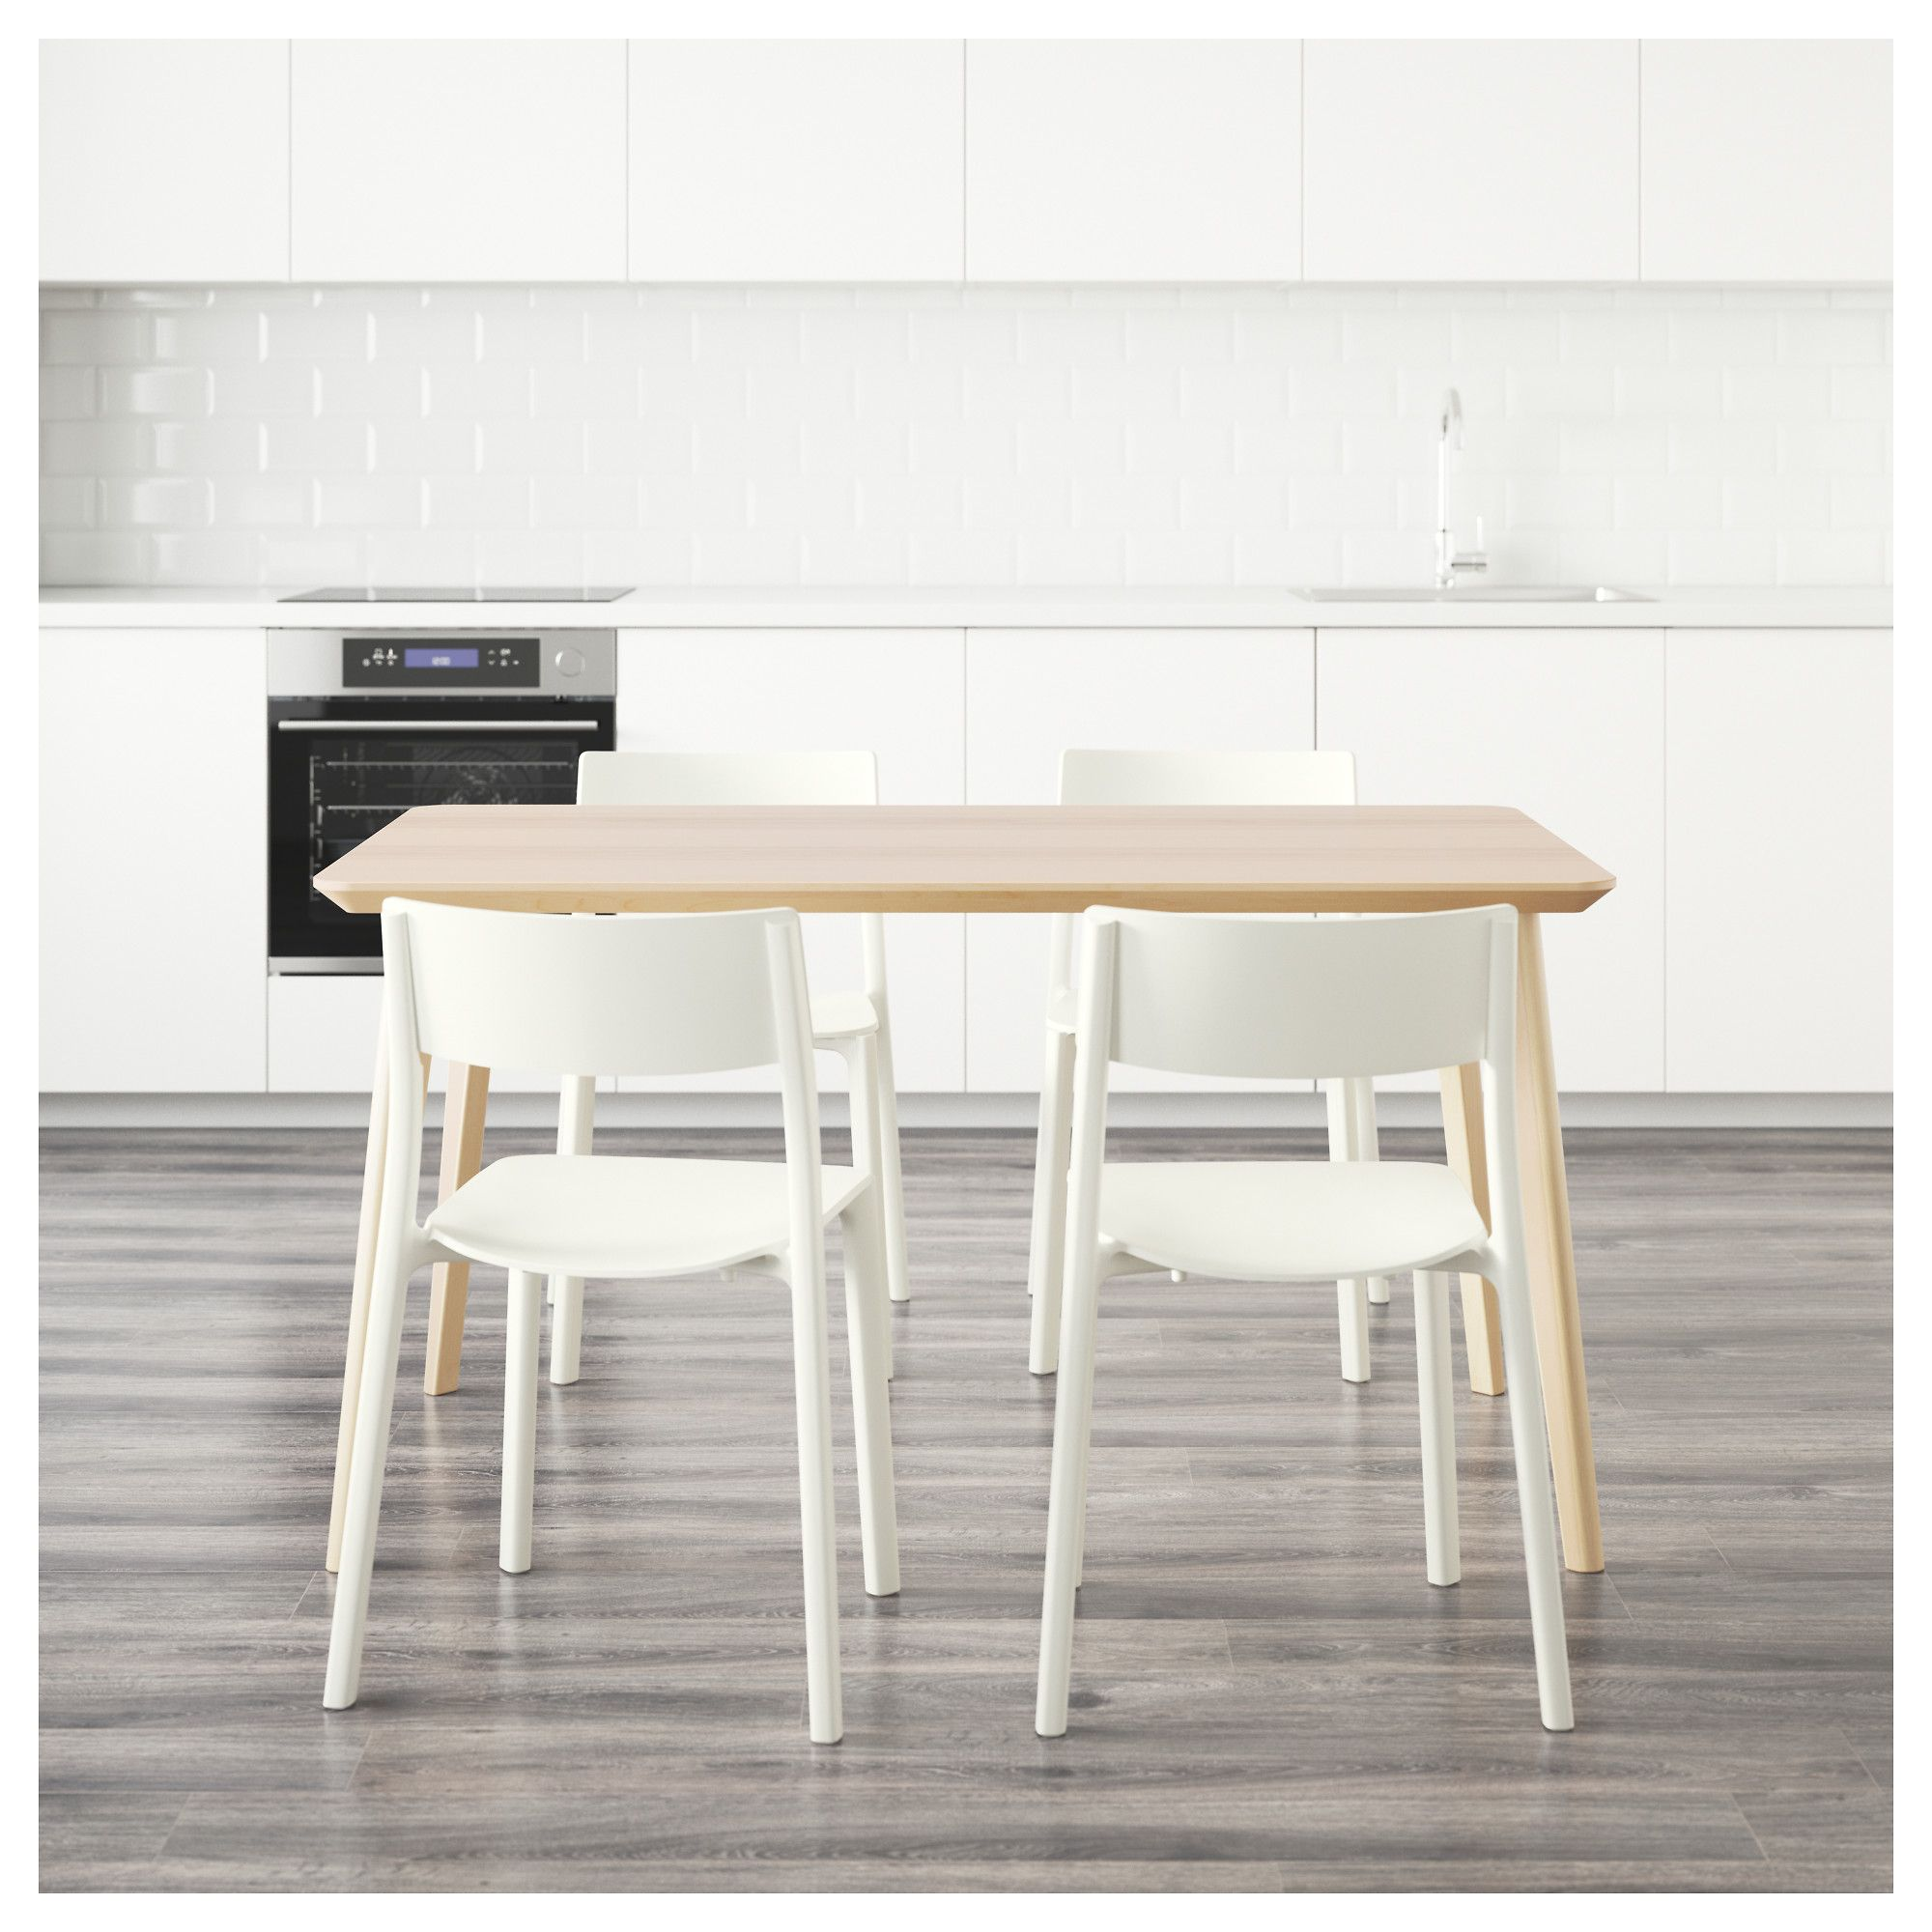 Janinge Table Chairs Ikea 0444486 Pe595019 S5jpg